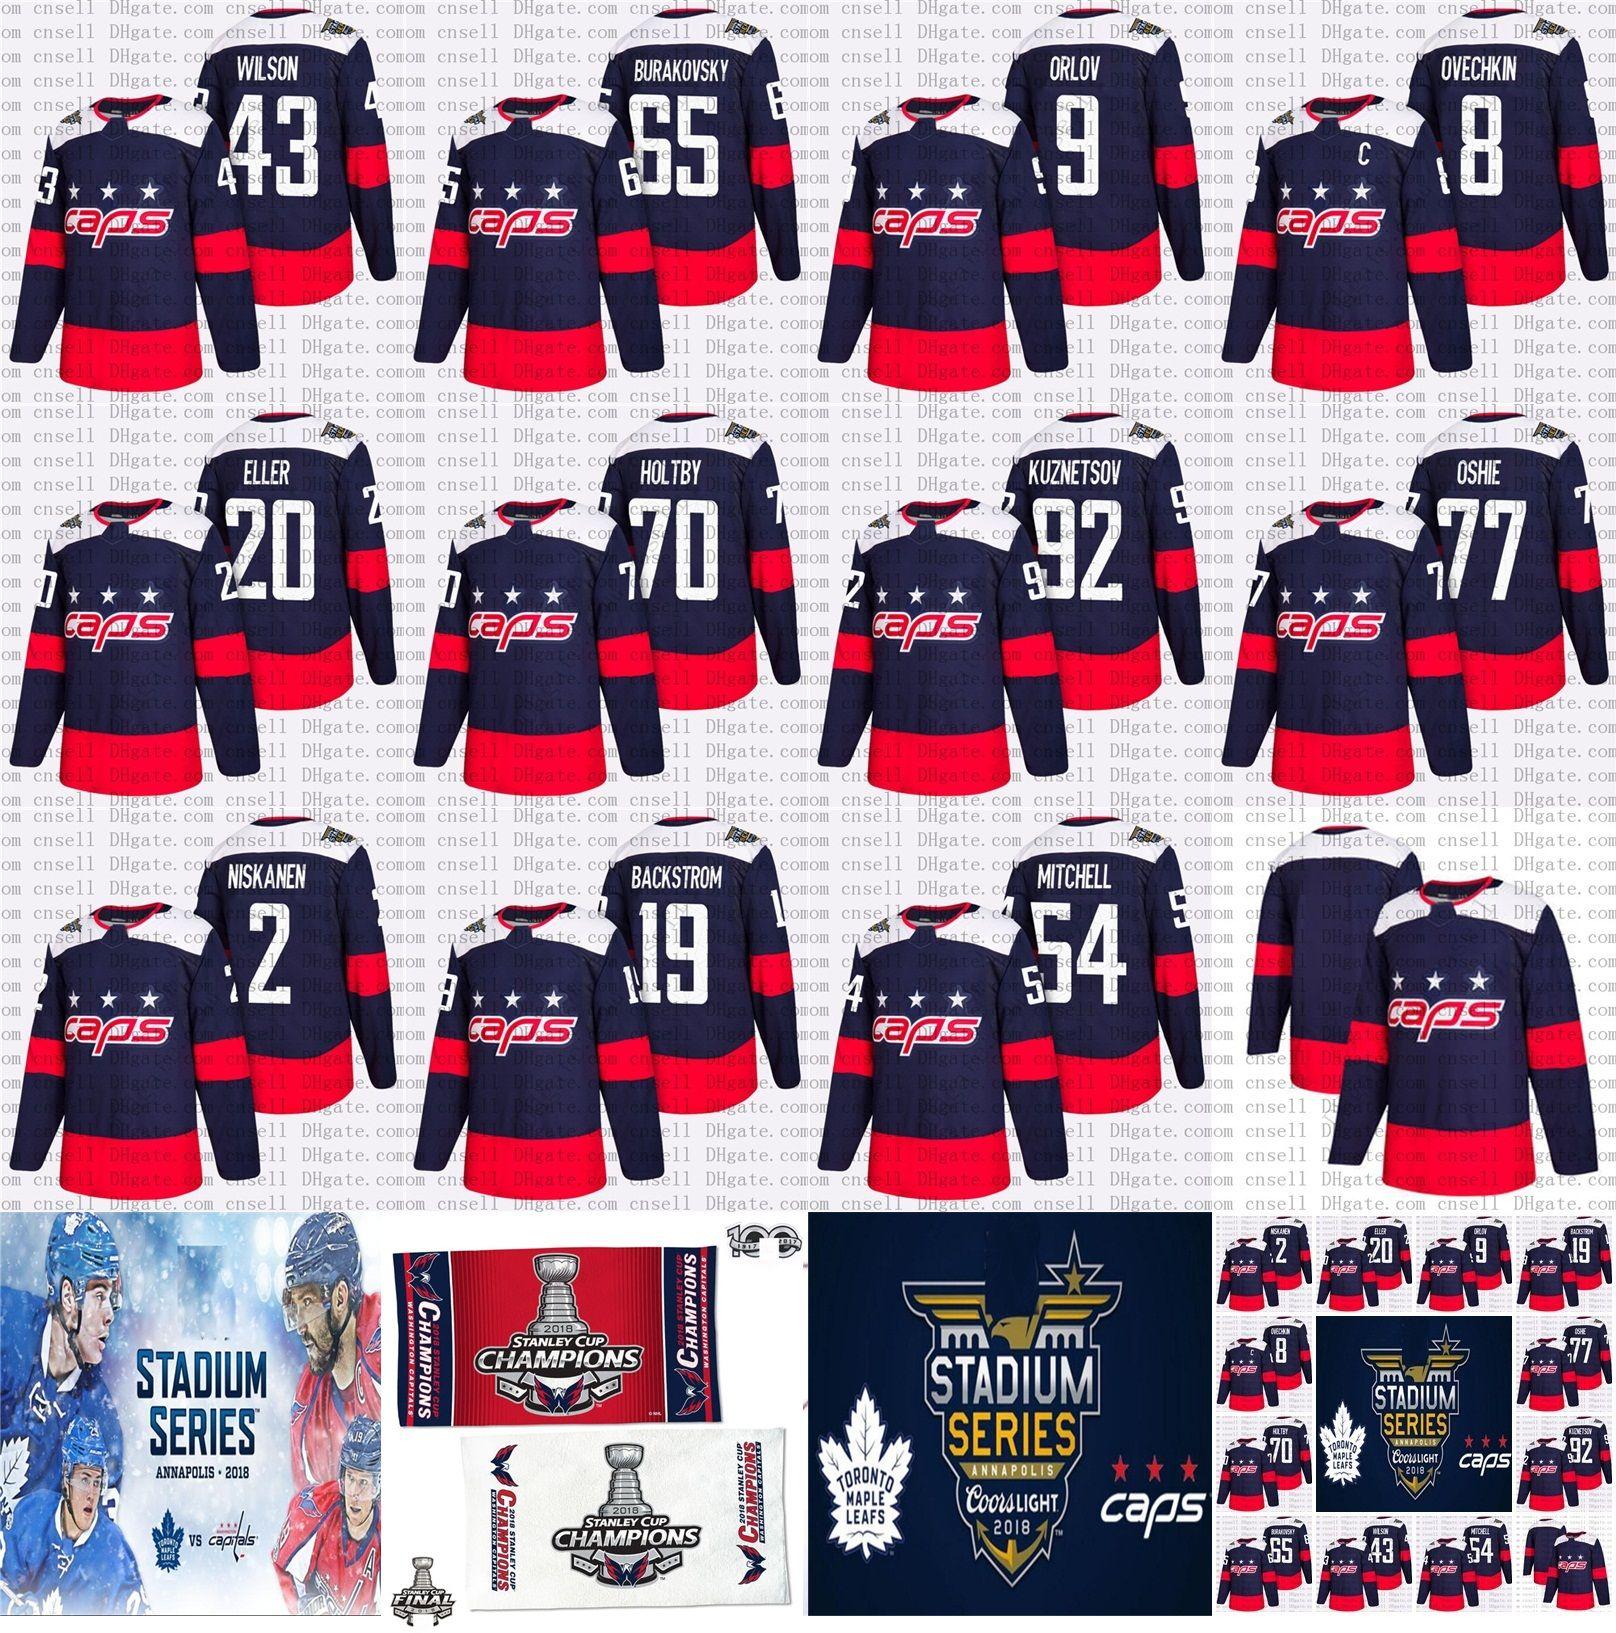 2019 2018 Stadium Series Stanley Cup Final Champion Men Lady Youth  Backstrom T.J. Oshie Evgeny Kuznetsov Beagle Washington Capitals Hockey  Jersey From Cn ... 4df1f904b